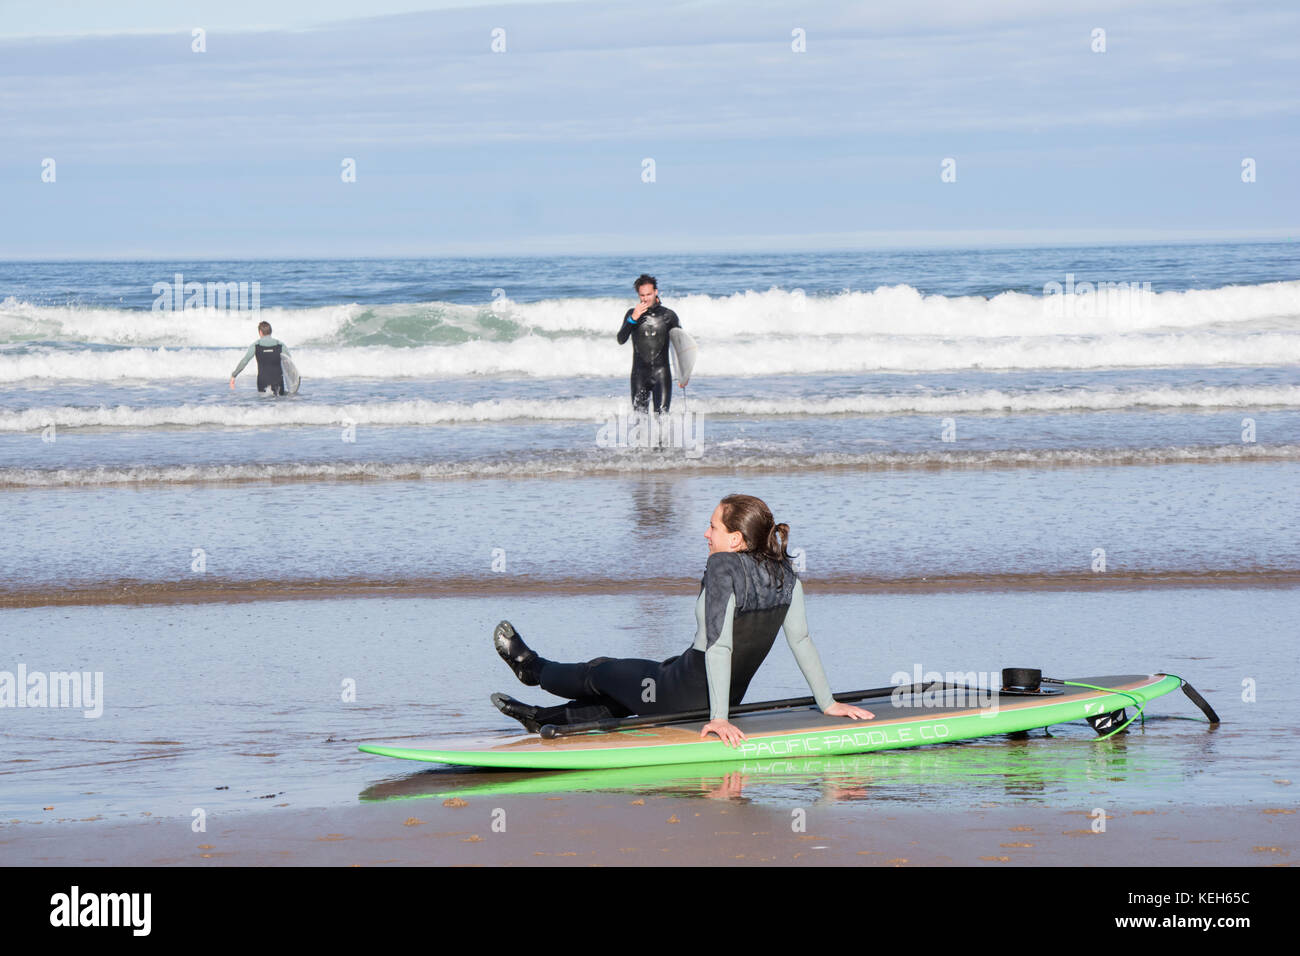 Surfing on Bamburgh beach, Northumberland, England, UK Stock Photo